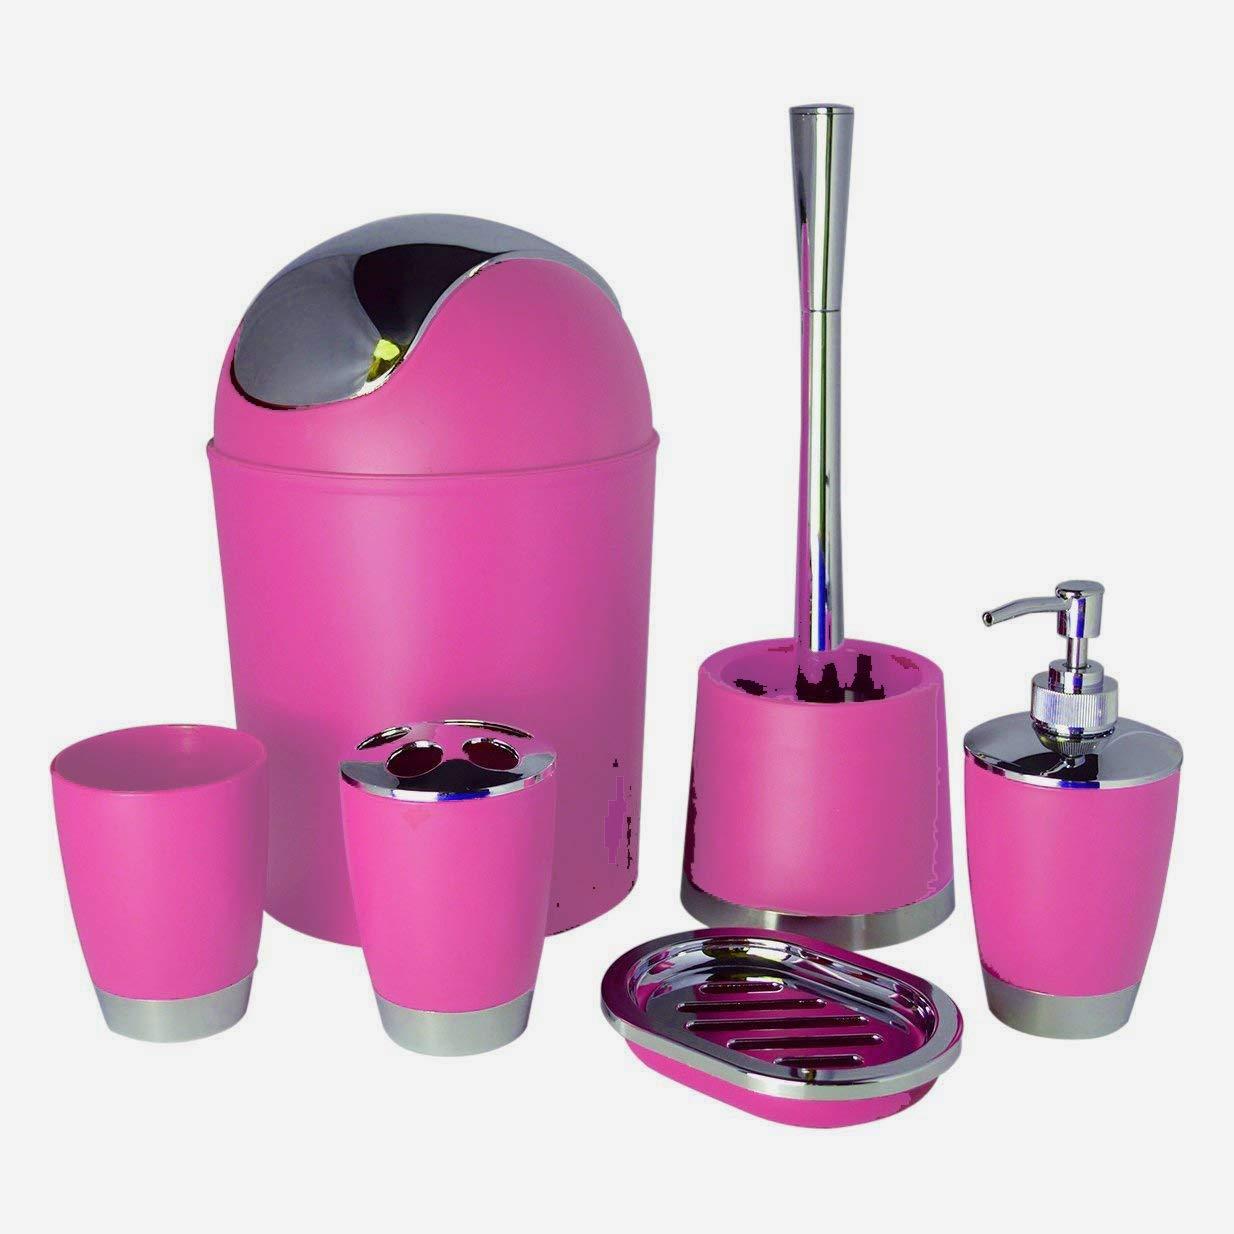 Bathlux Modern Design 6 Piece Bathroom Accessory Set , Toilet Brush , Waste Bin, Soap Dish, Tooth Brush Holder Soap Dispenser, Rinse Cup (Black)